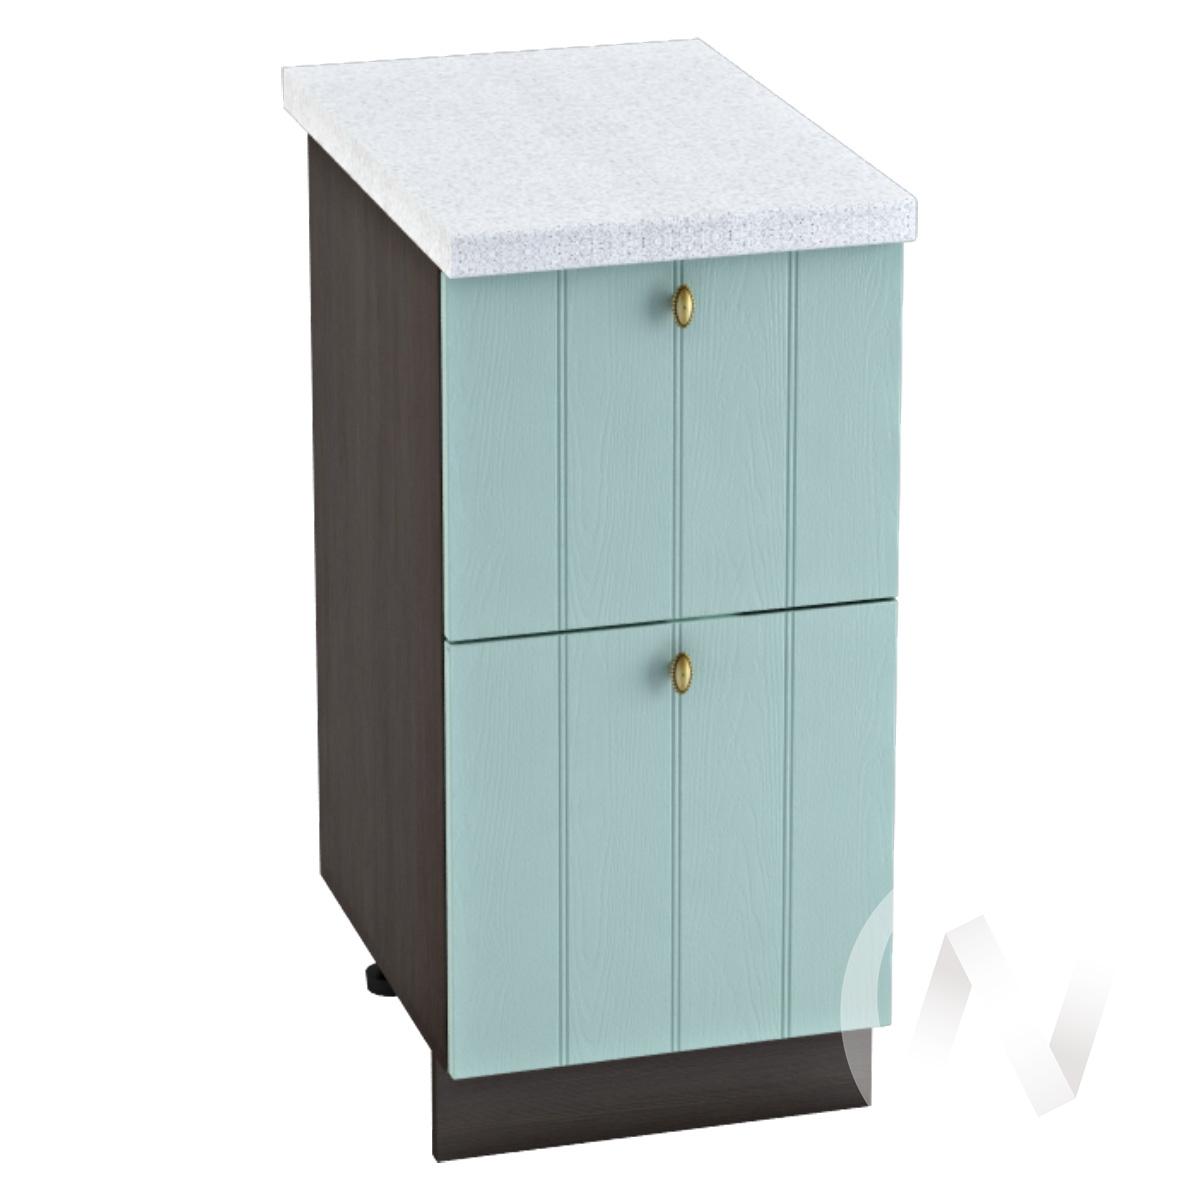 "Кухня ""Прованс"": Шкаф нижний с 2-мя ящиками 400, ШН2Я 400 (голубой/корпус венге)"